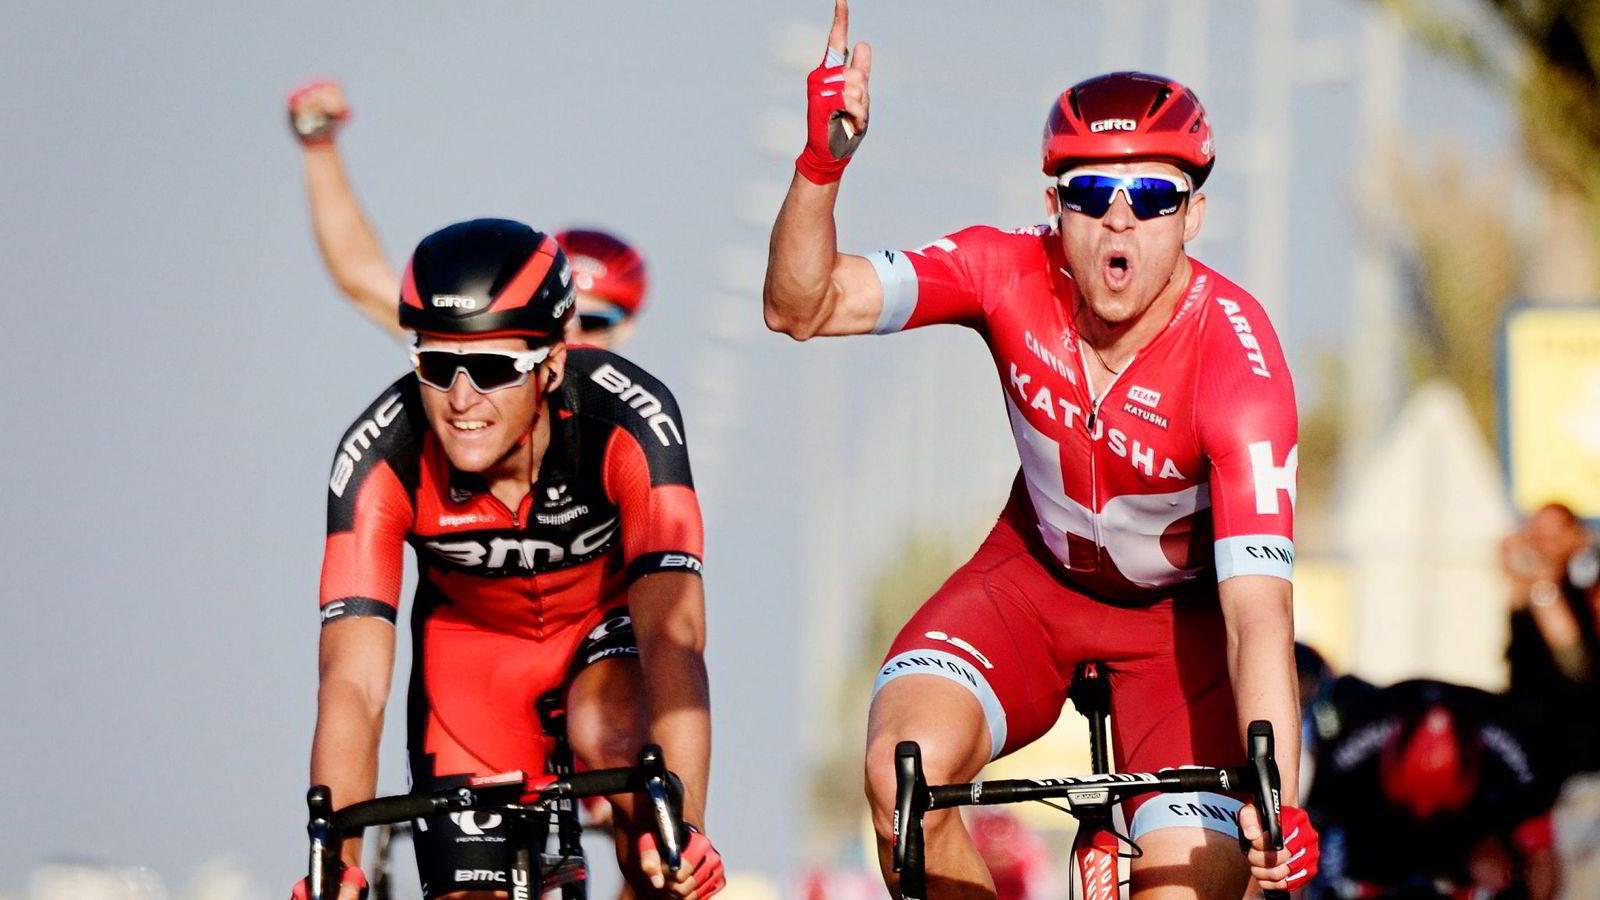 Katusha-rytter Alexander Kristoff spurtslår BMCs Greg Van Avermaet på den fjerde etappen i Qatar Rundt i februar i år. Til helgen venter klassikeren Flandern Rundt, et av Kristoffs store mål for sesongen. Foto: Eric Feferberg, AFP/NTB Scanpix